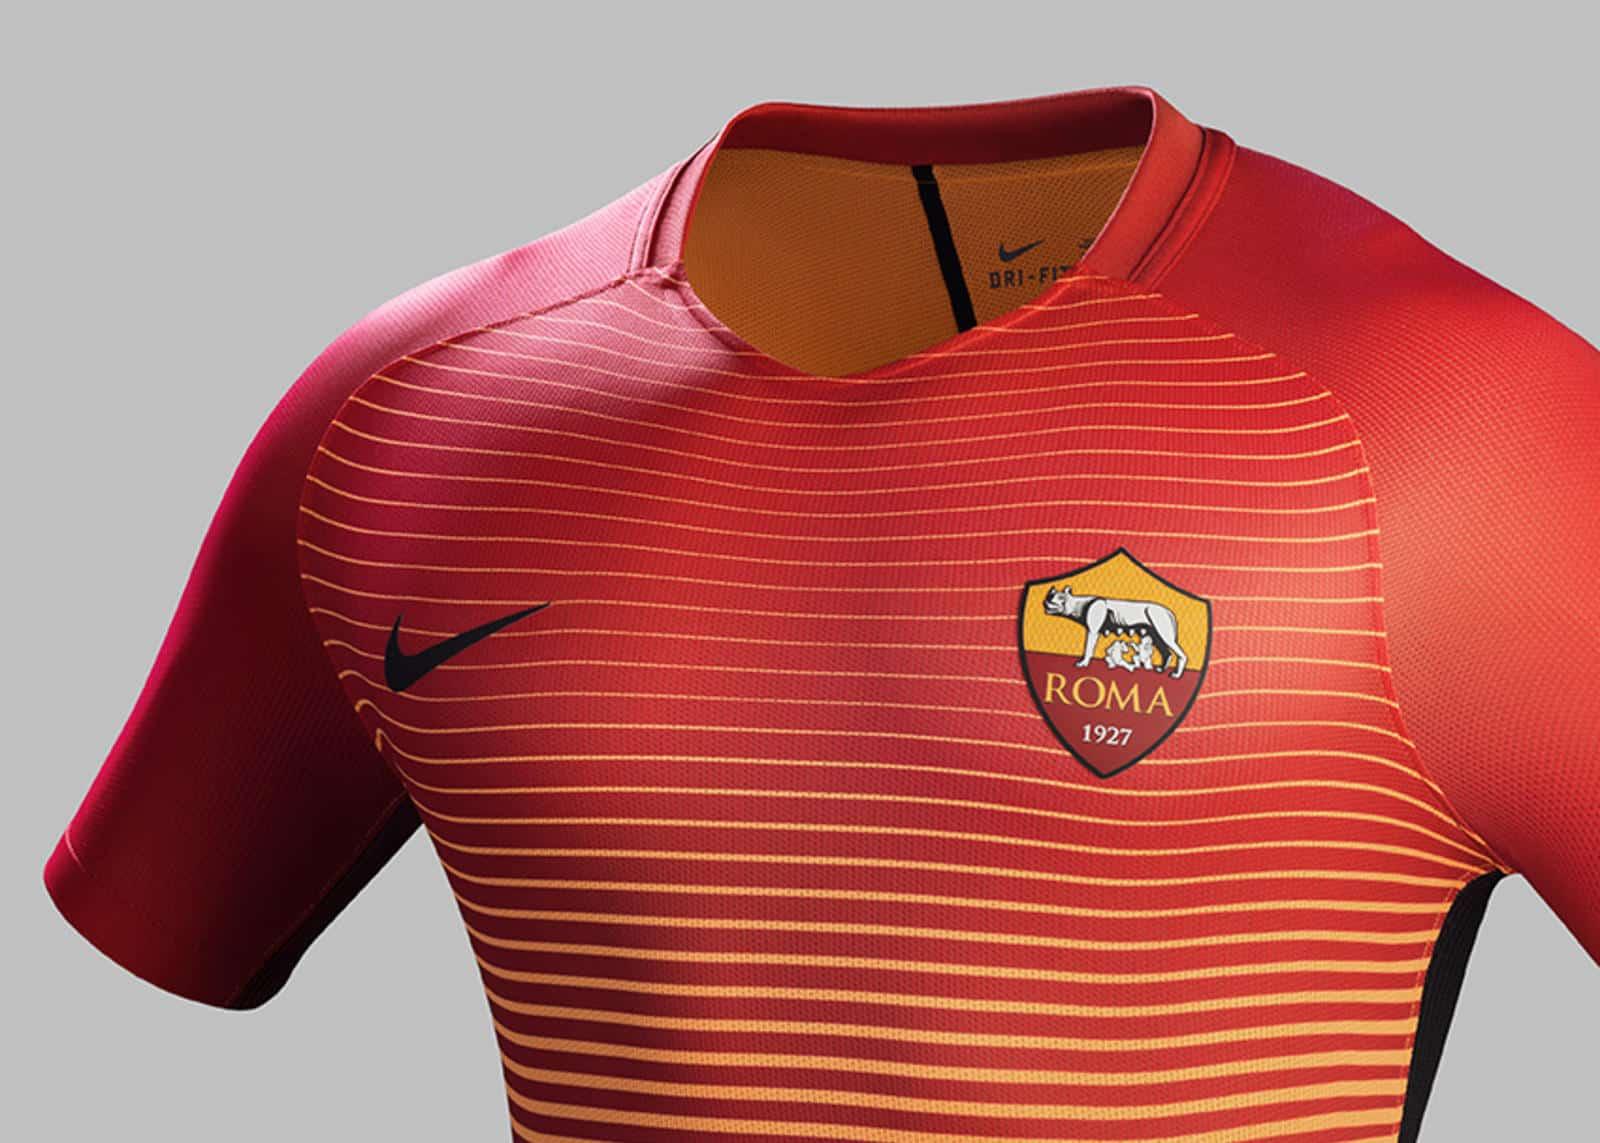 L 39 as rome pr sente ses maillots 2016 2017 sign s nike - Moacasa 2017 roma ...